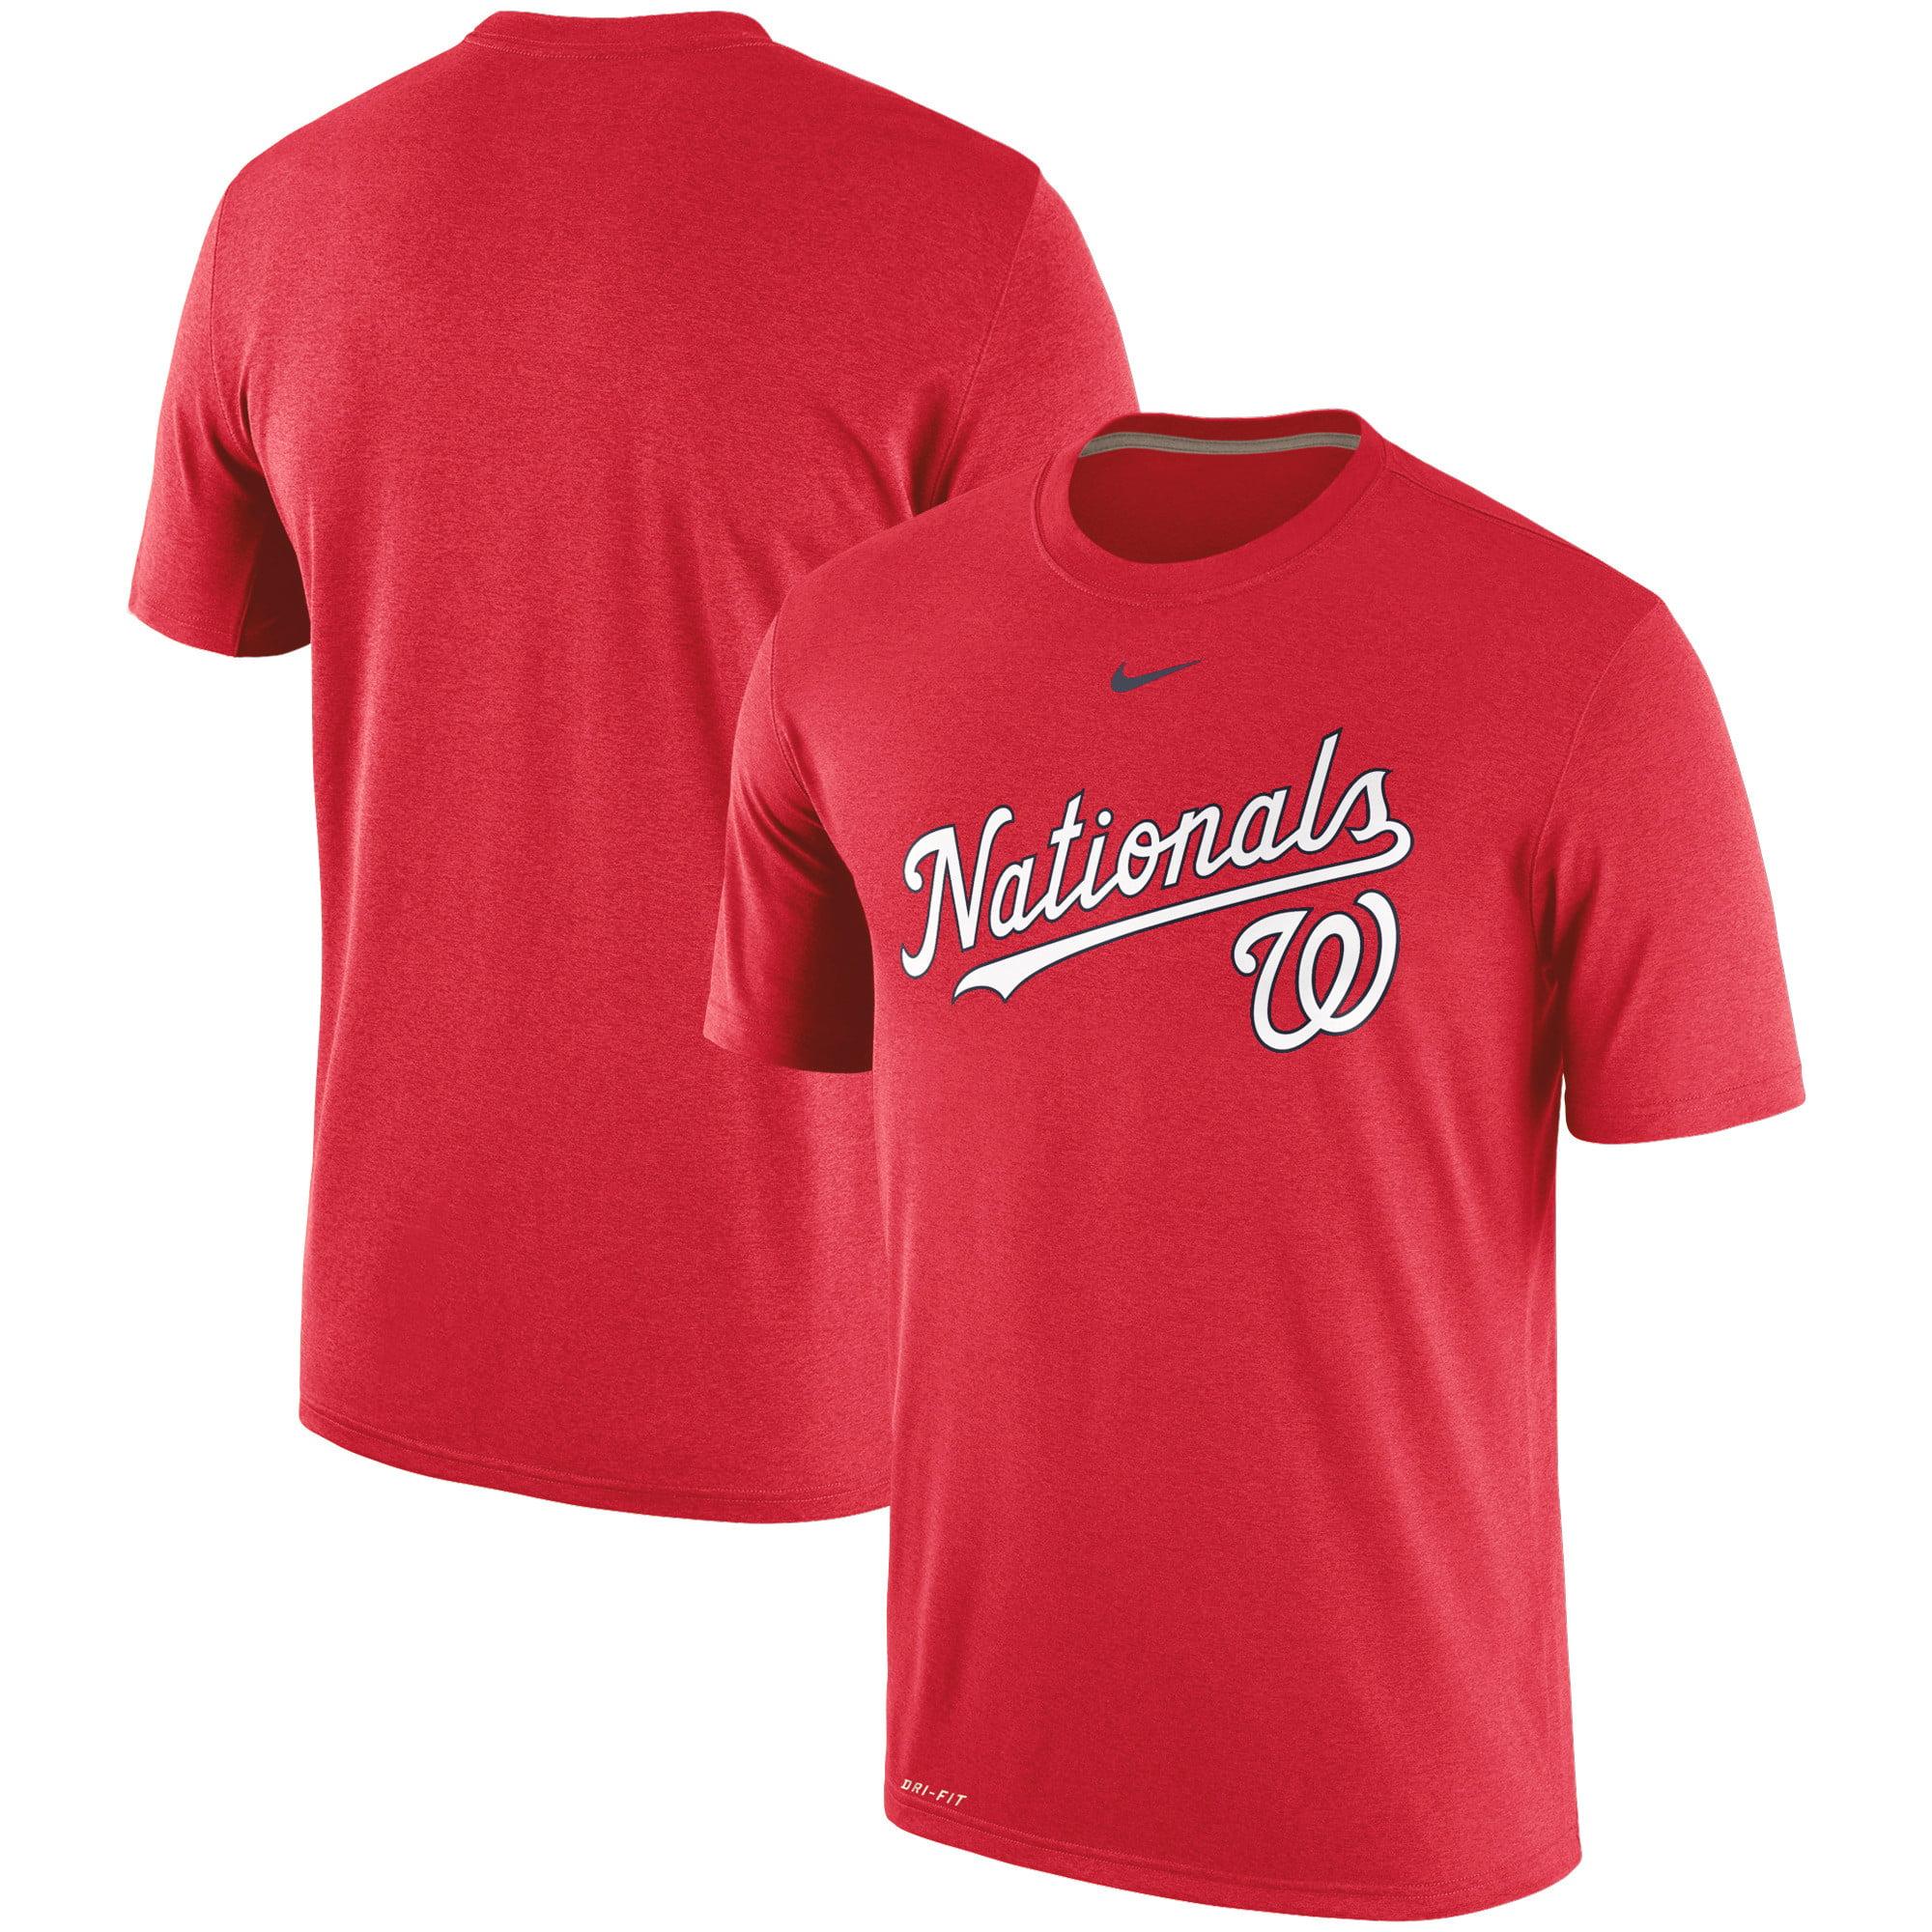 Washington Nationals Nike Legend Primary Logo Performance T-Shirt - Red -  Walmart.com 938088acb